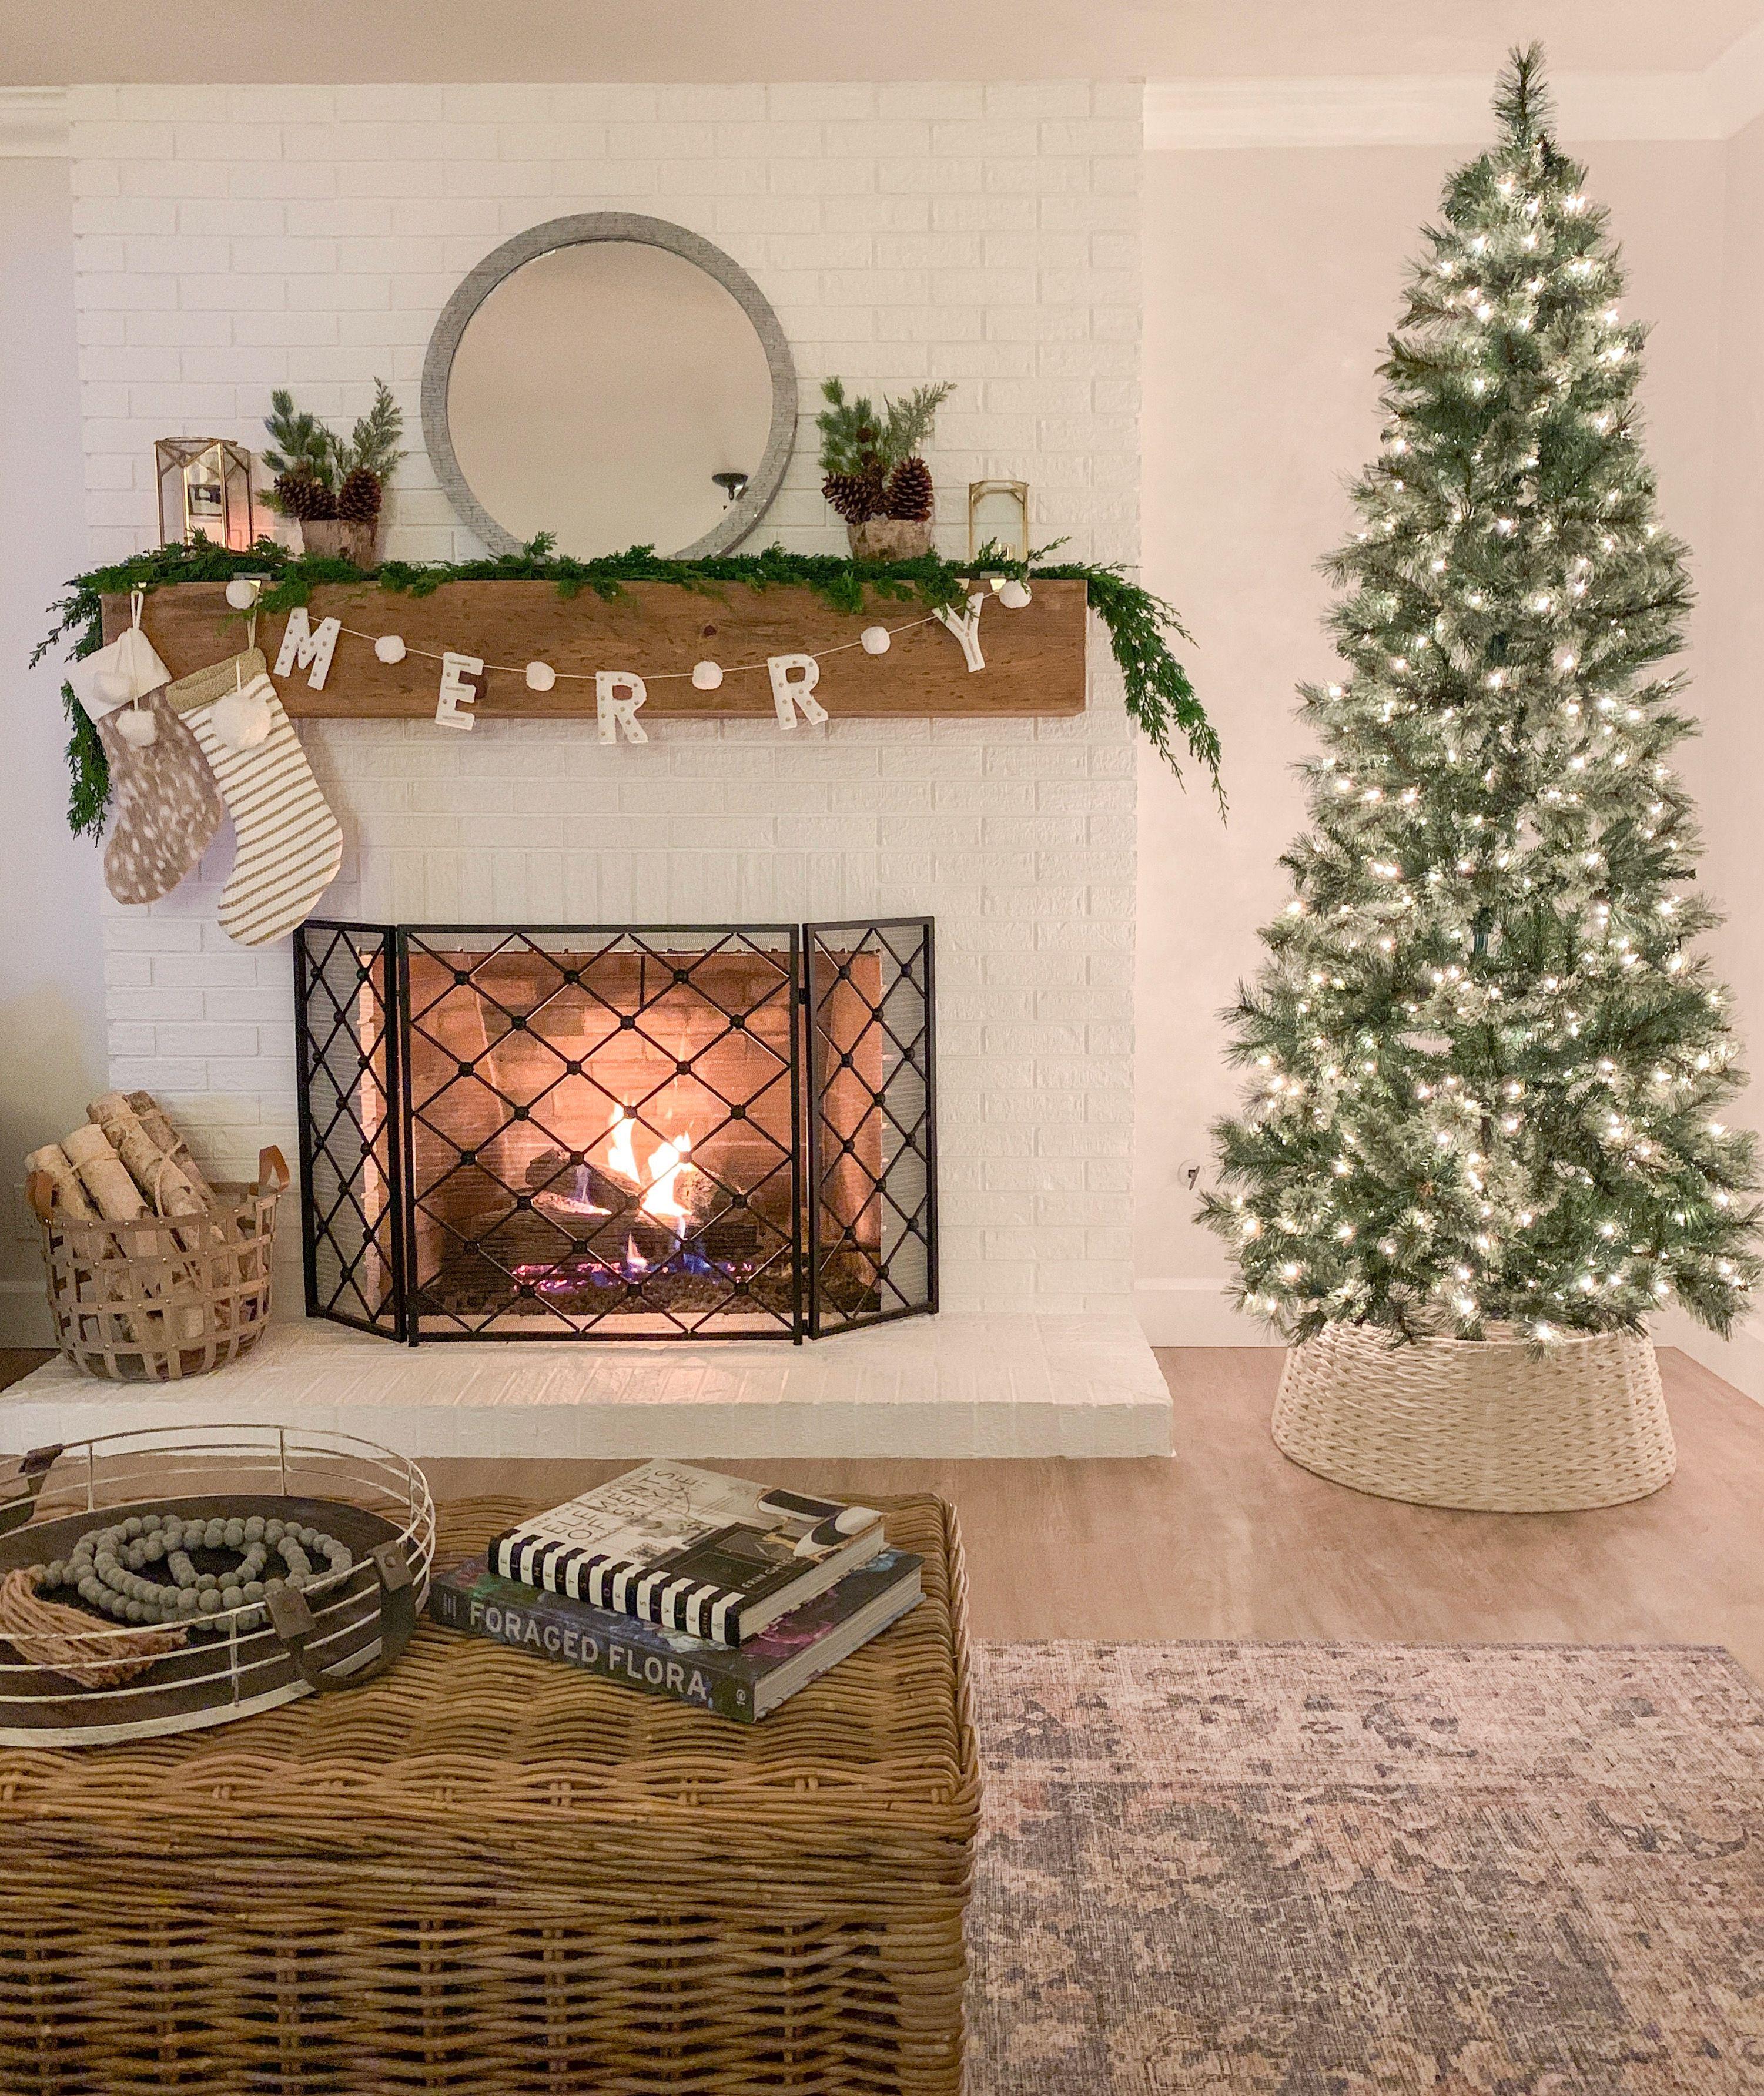 Neutral Cozy Christmas Living Room Cozy Christmas Living Room Christmas Living Rooms Holiday Mantel